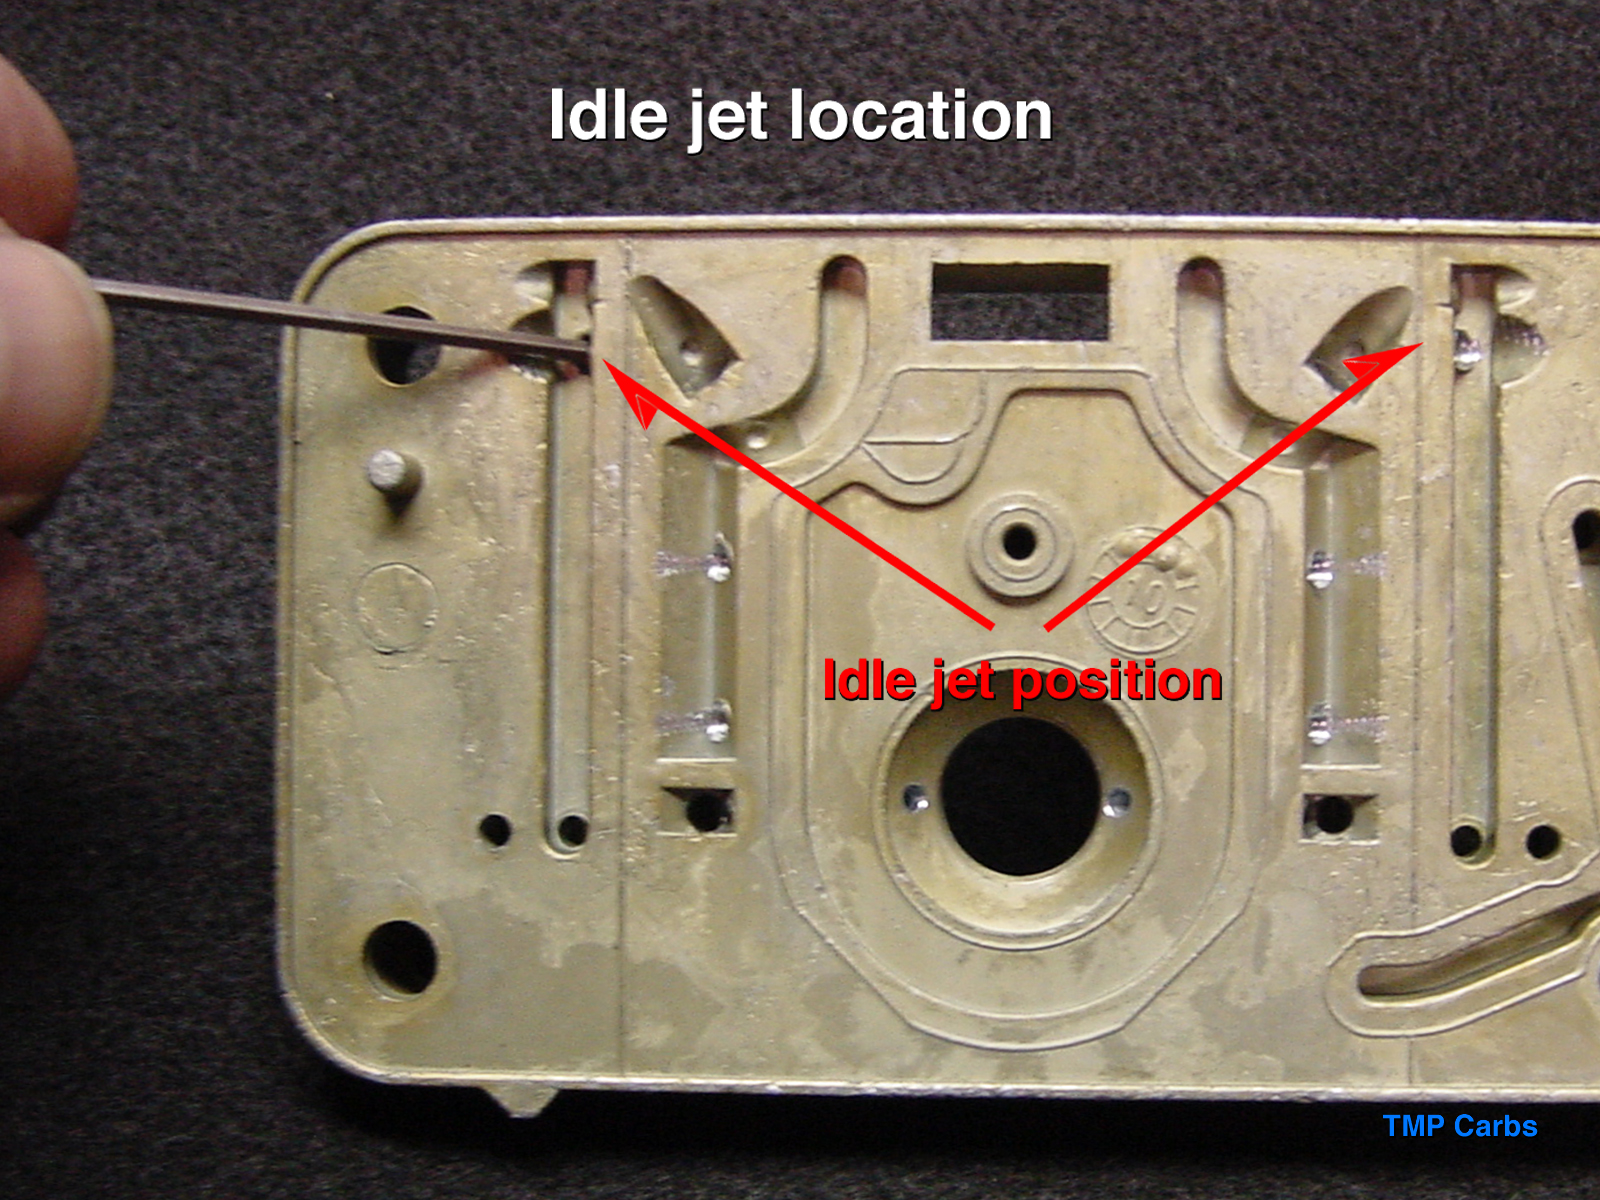 edelbrock carburetors jet location